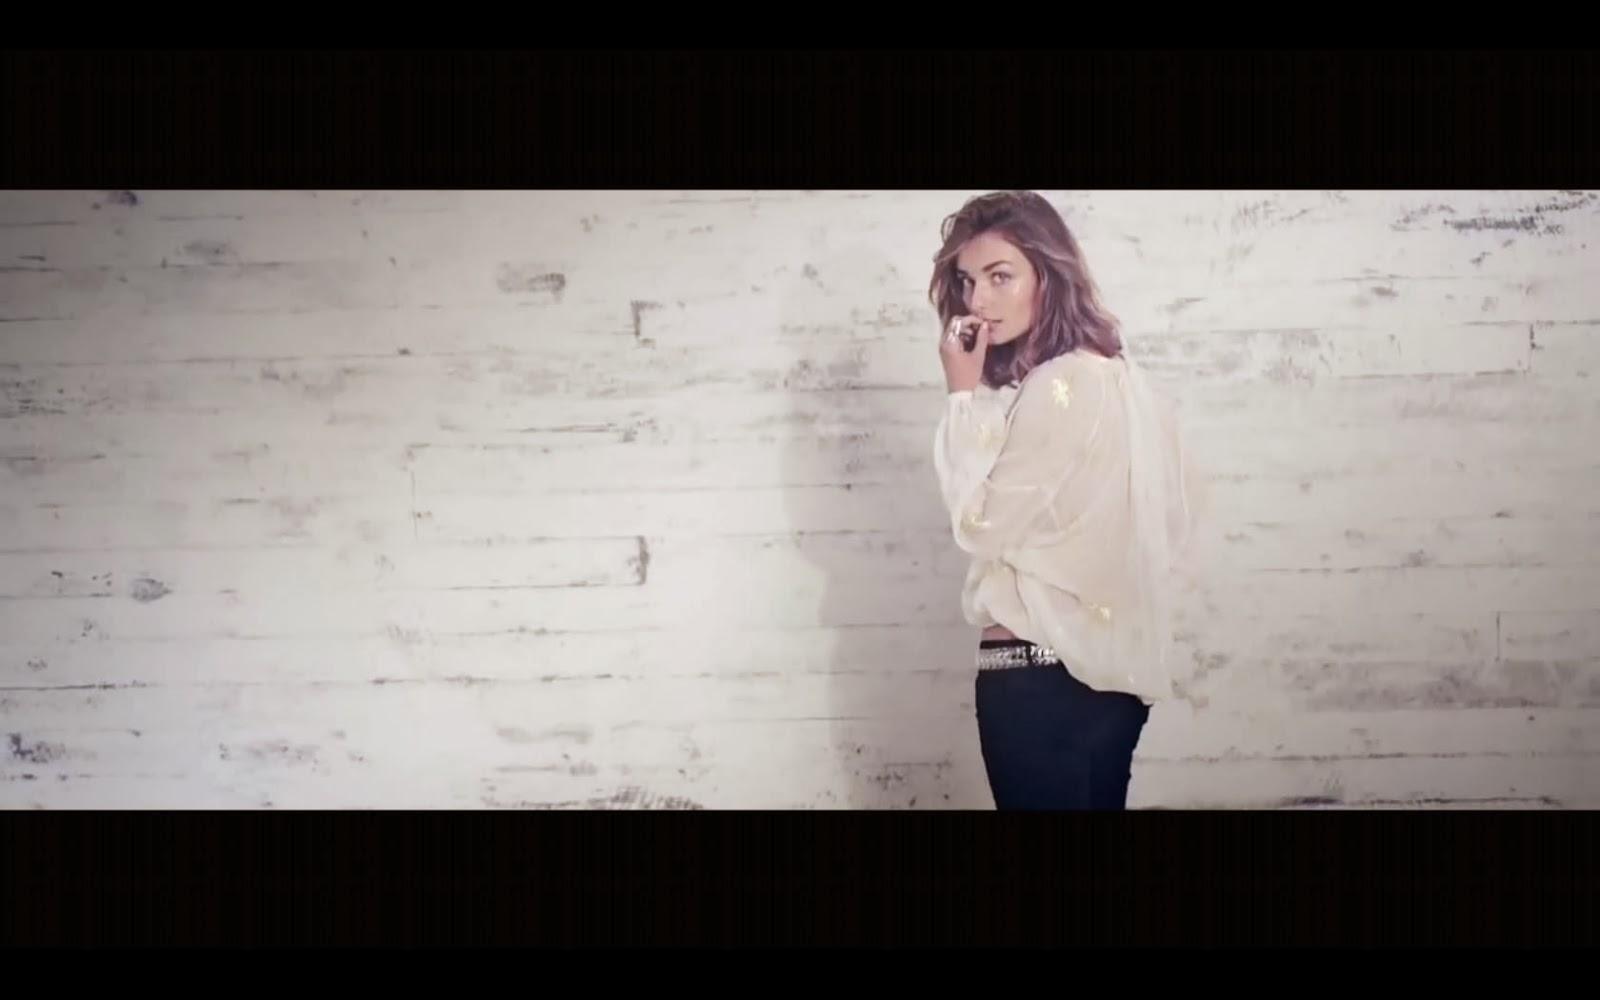 2170f6bbe2f 13 υπέροχα ανοιξιάτικα και καλοκαιρινά H&M looks παρουσιάζονται στο video  της καμπάνιας H&M S/S 2014... Δείτε μερικές φωτογραφίες και το video της  νέας ...